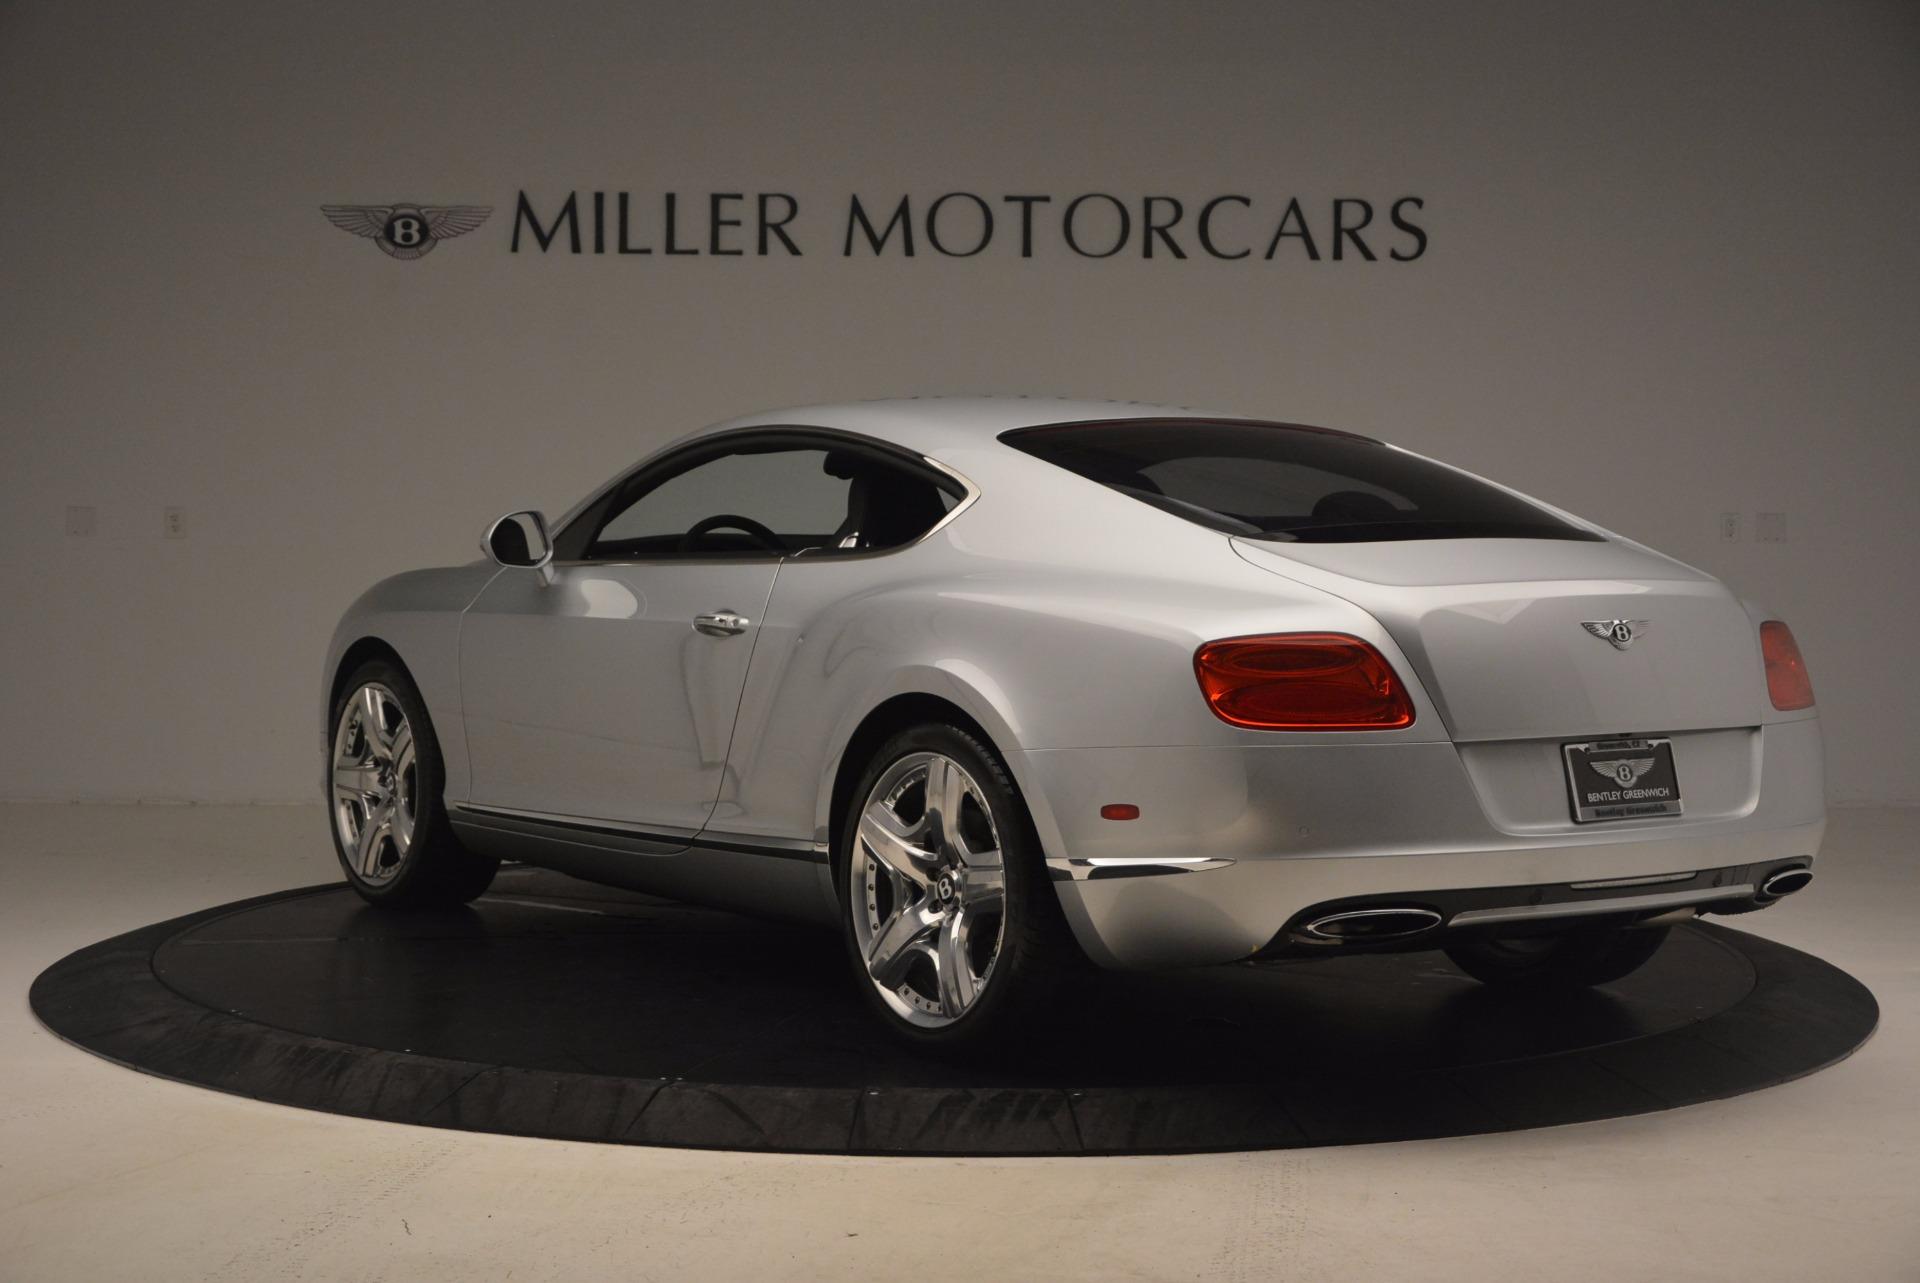 Used 2012 Bentley Continental GT  For Sale In Westport, CT 1176_p5